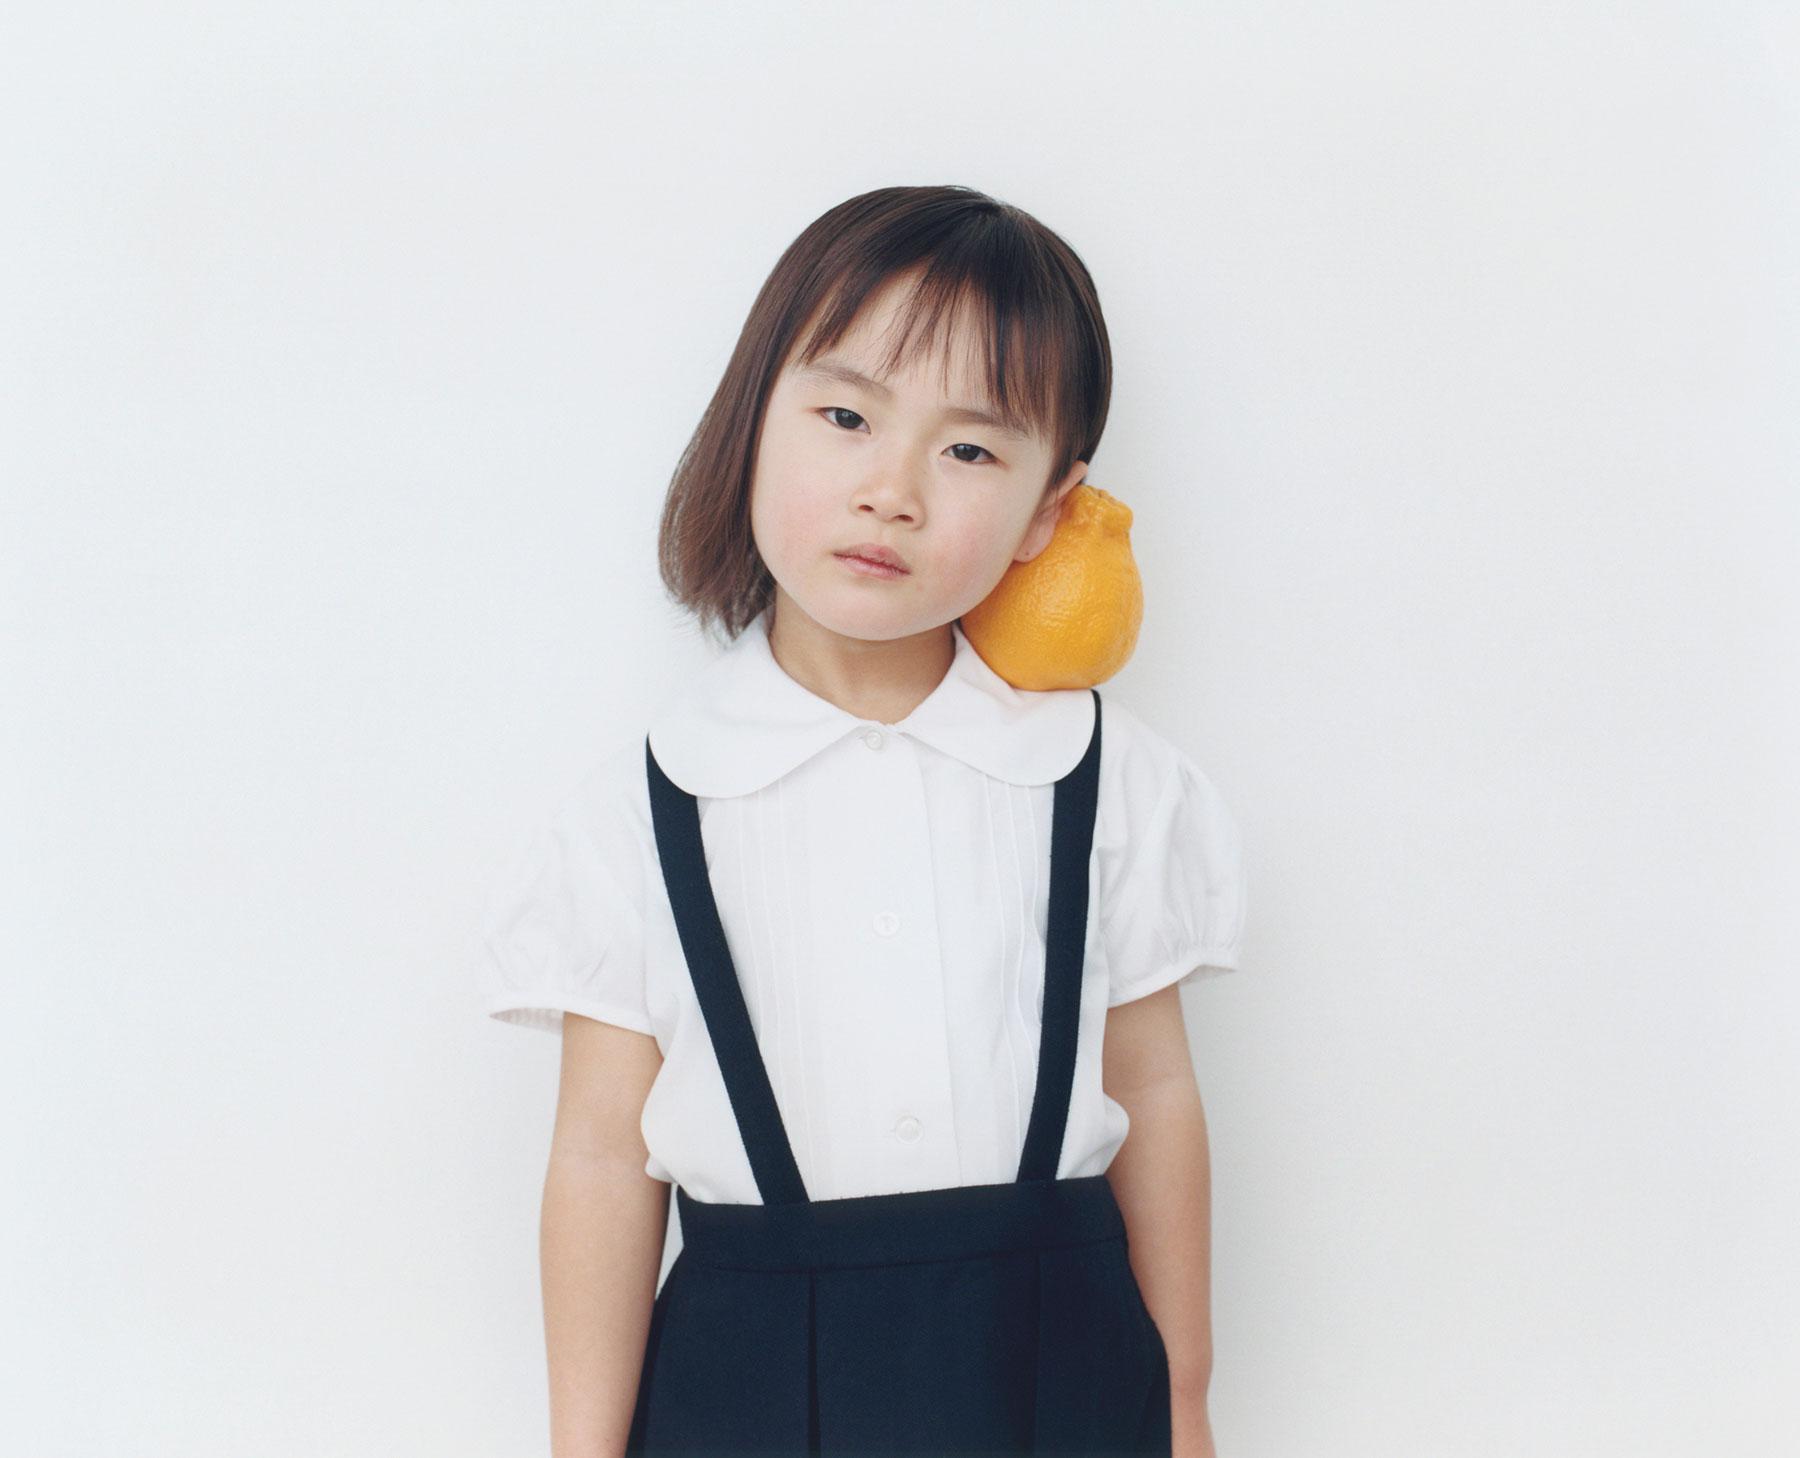 Osamu Yokonami,  1000 Children: Sumo Mandarin No. 5 , 2010-2013  Digital pigment print, 895 x 1105 mm (approx. 34.25 x 43.5 in), edition of 5; 146 x 168 mm (approx. 5.75 x 6.6 in), edition of 10   Inquire